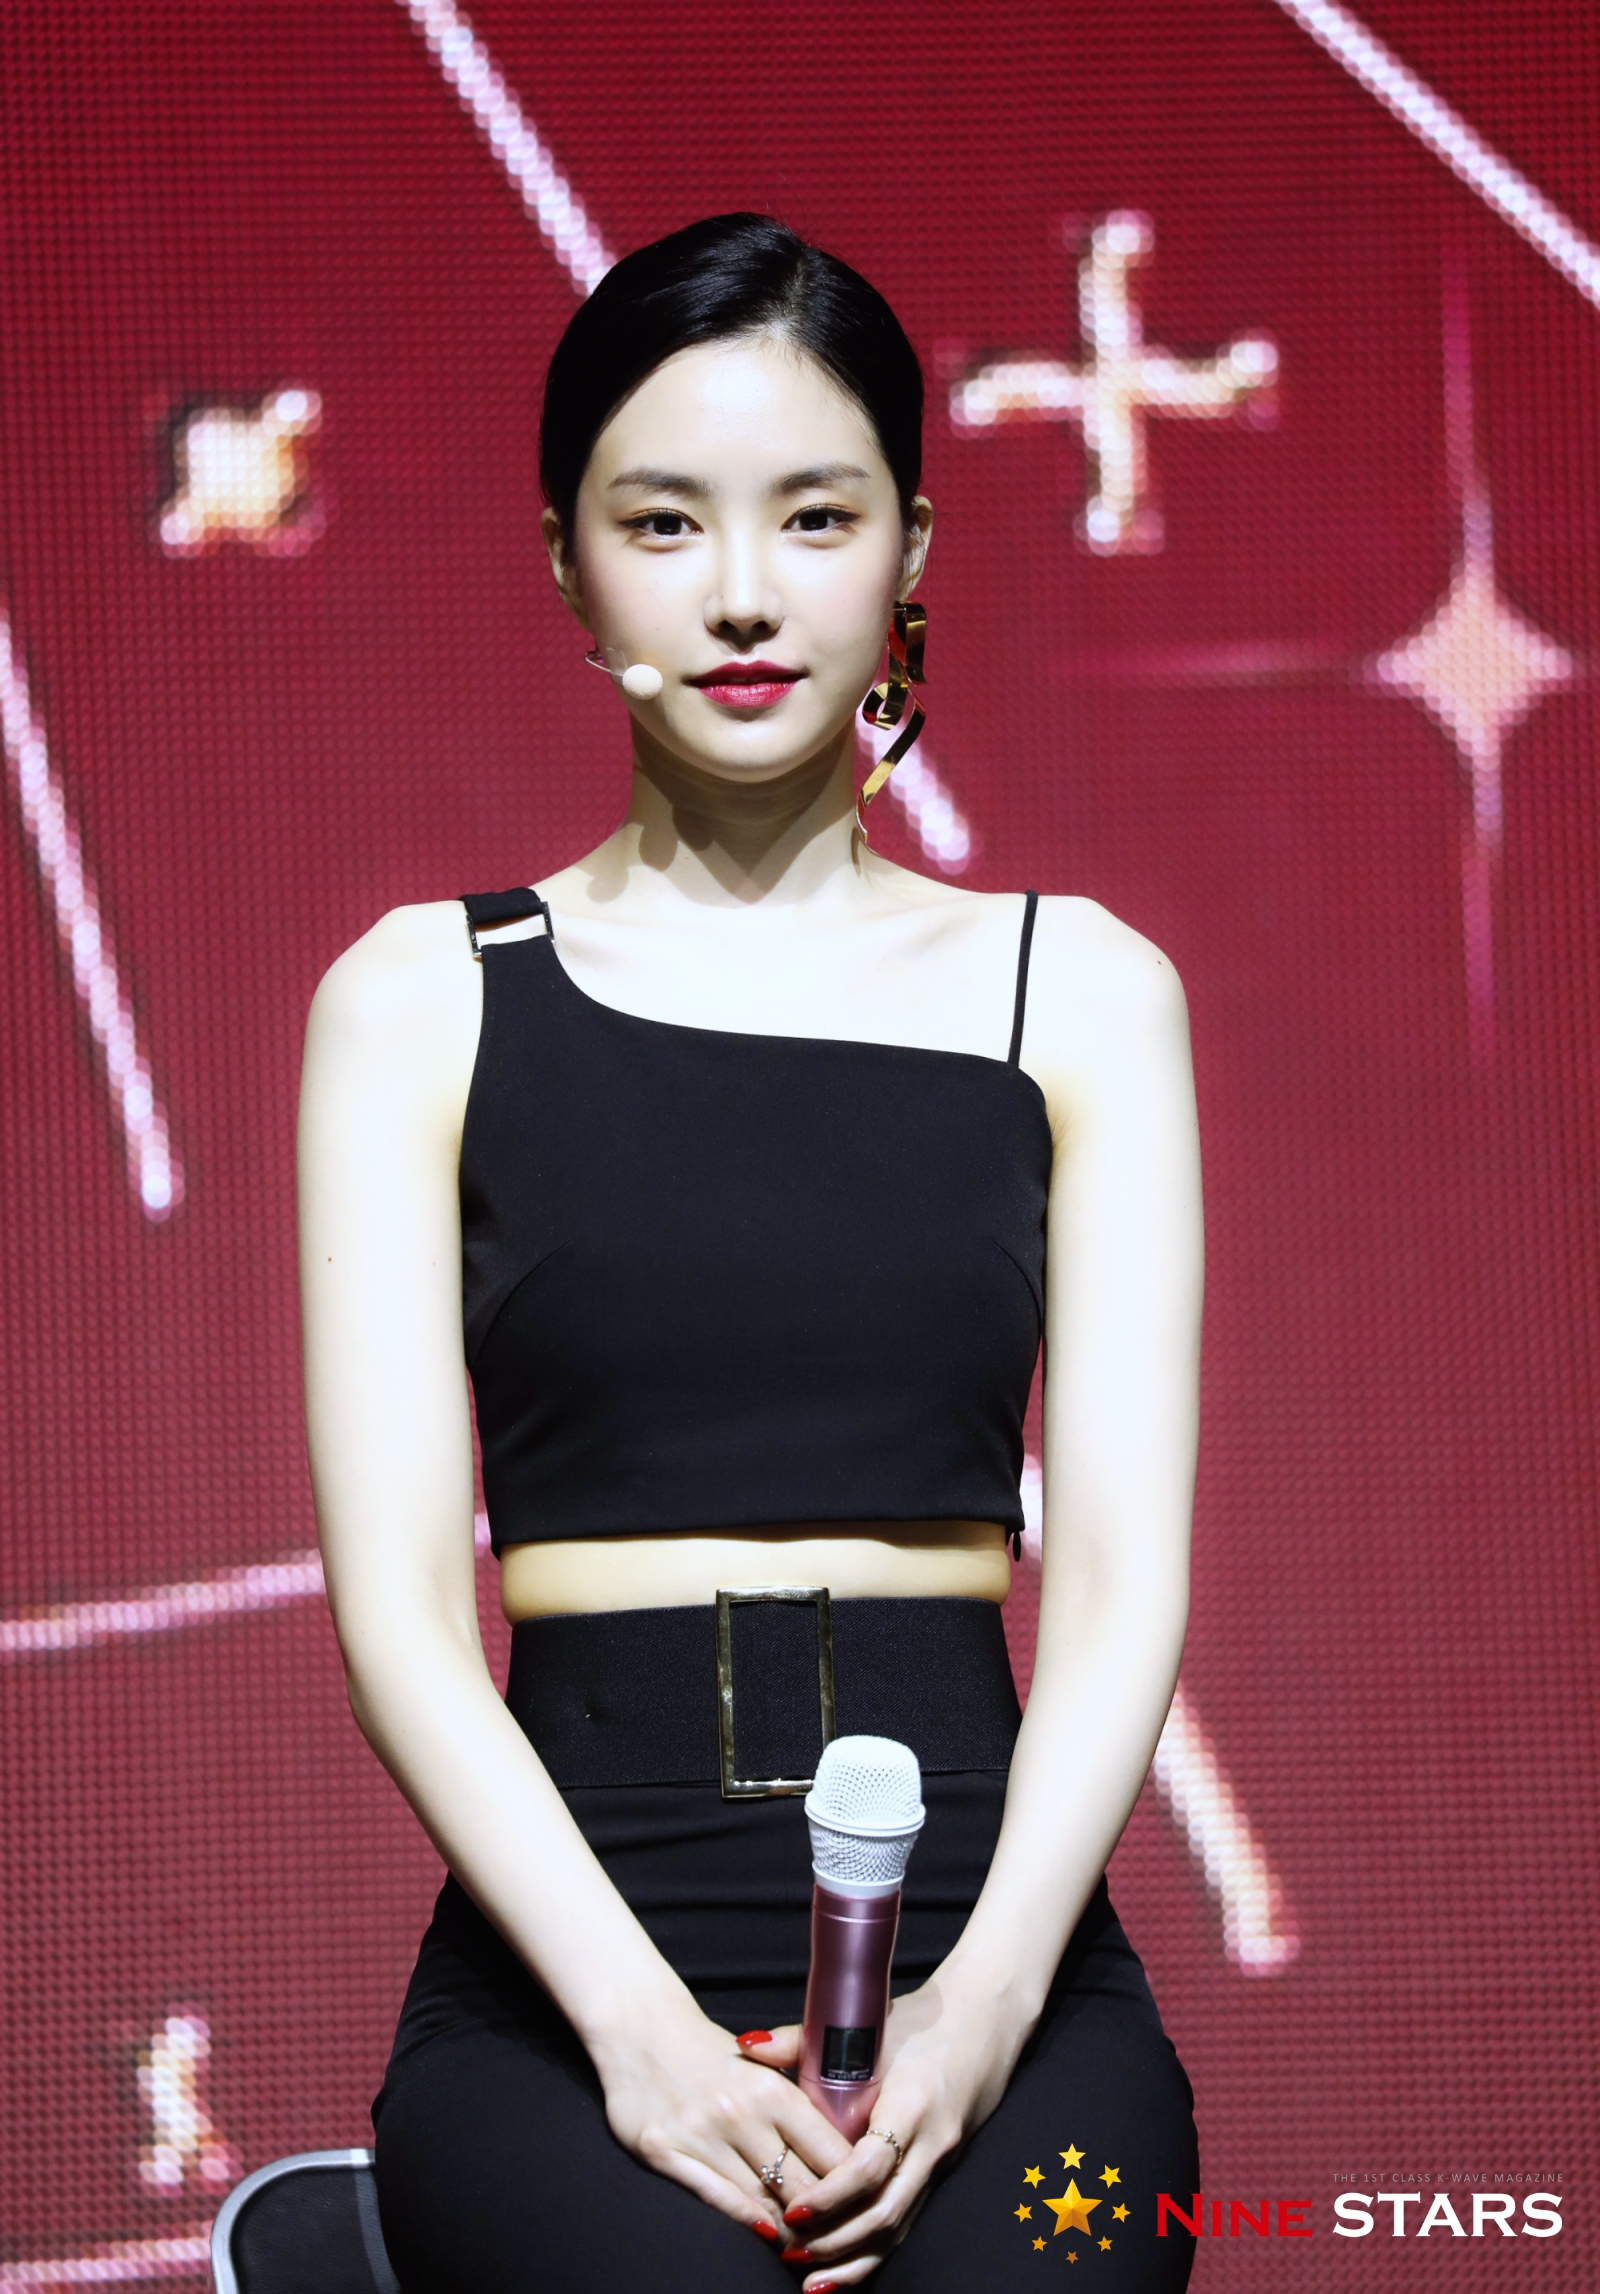 son naeun plastic surgery rumors 6